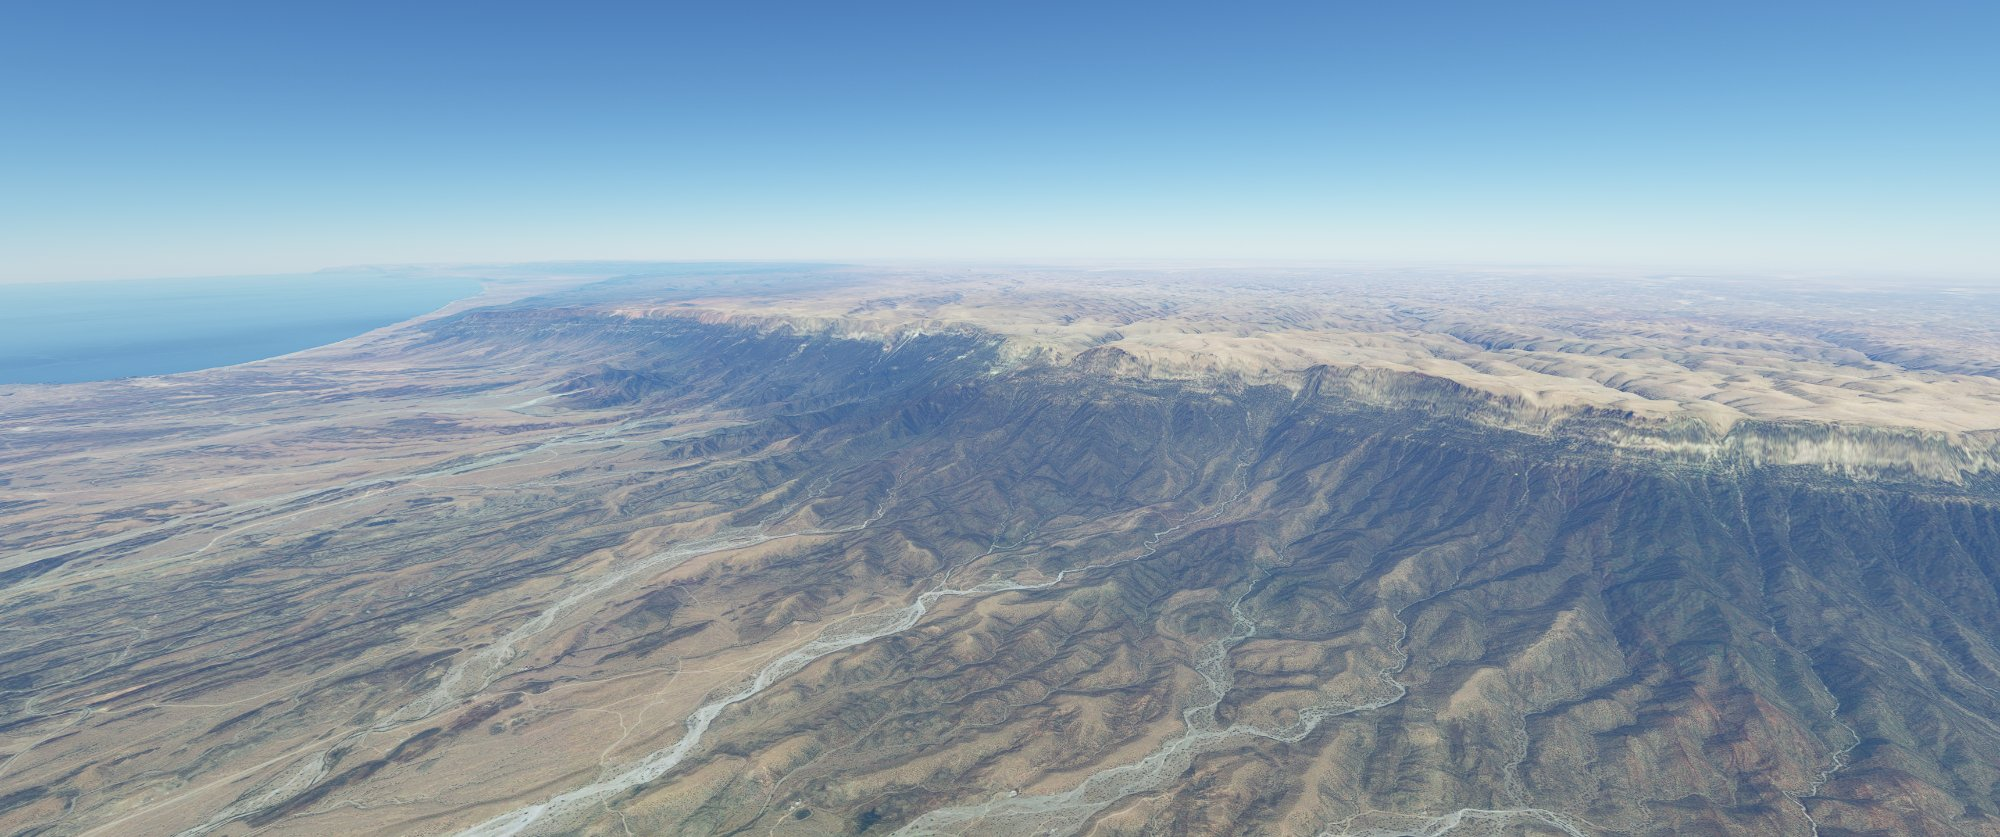 Microsoft Flight Simulator Screenshot 2020.12.18 - 14.28.20.38.jpg